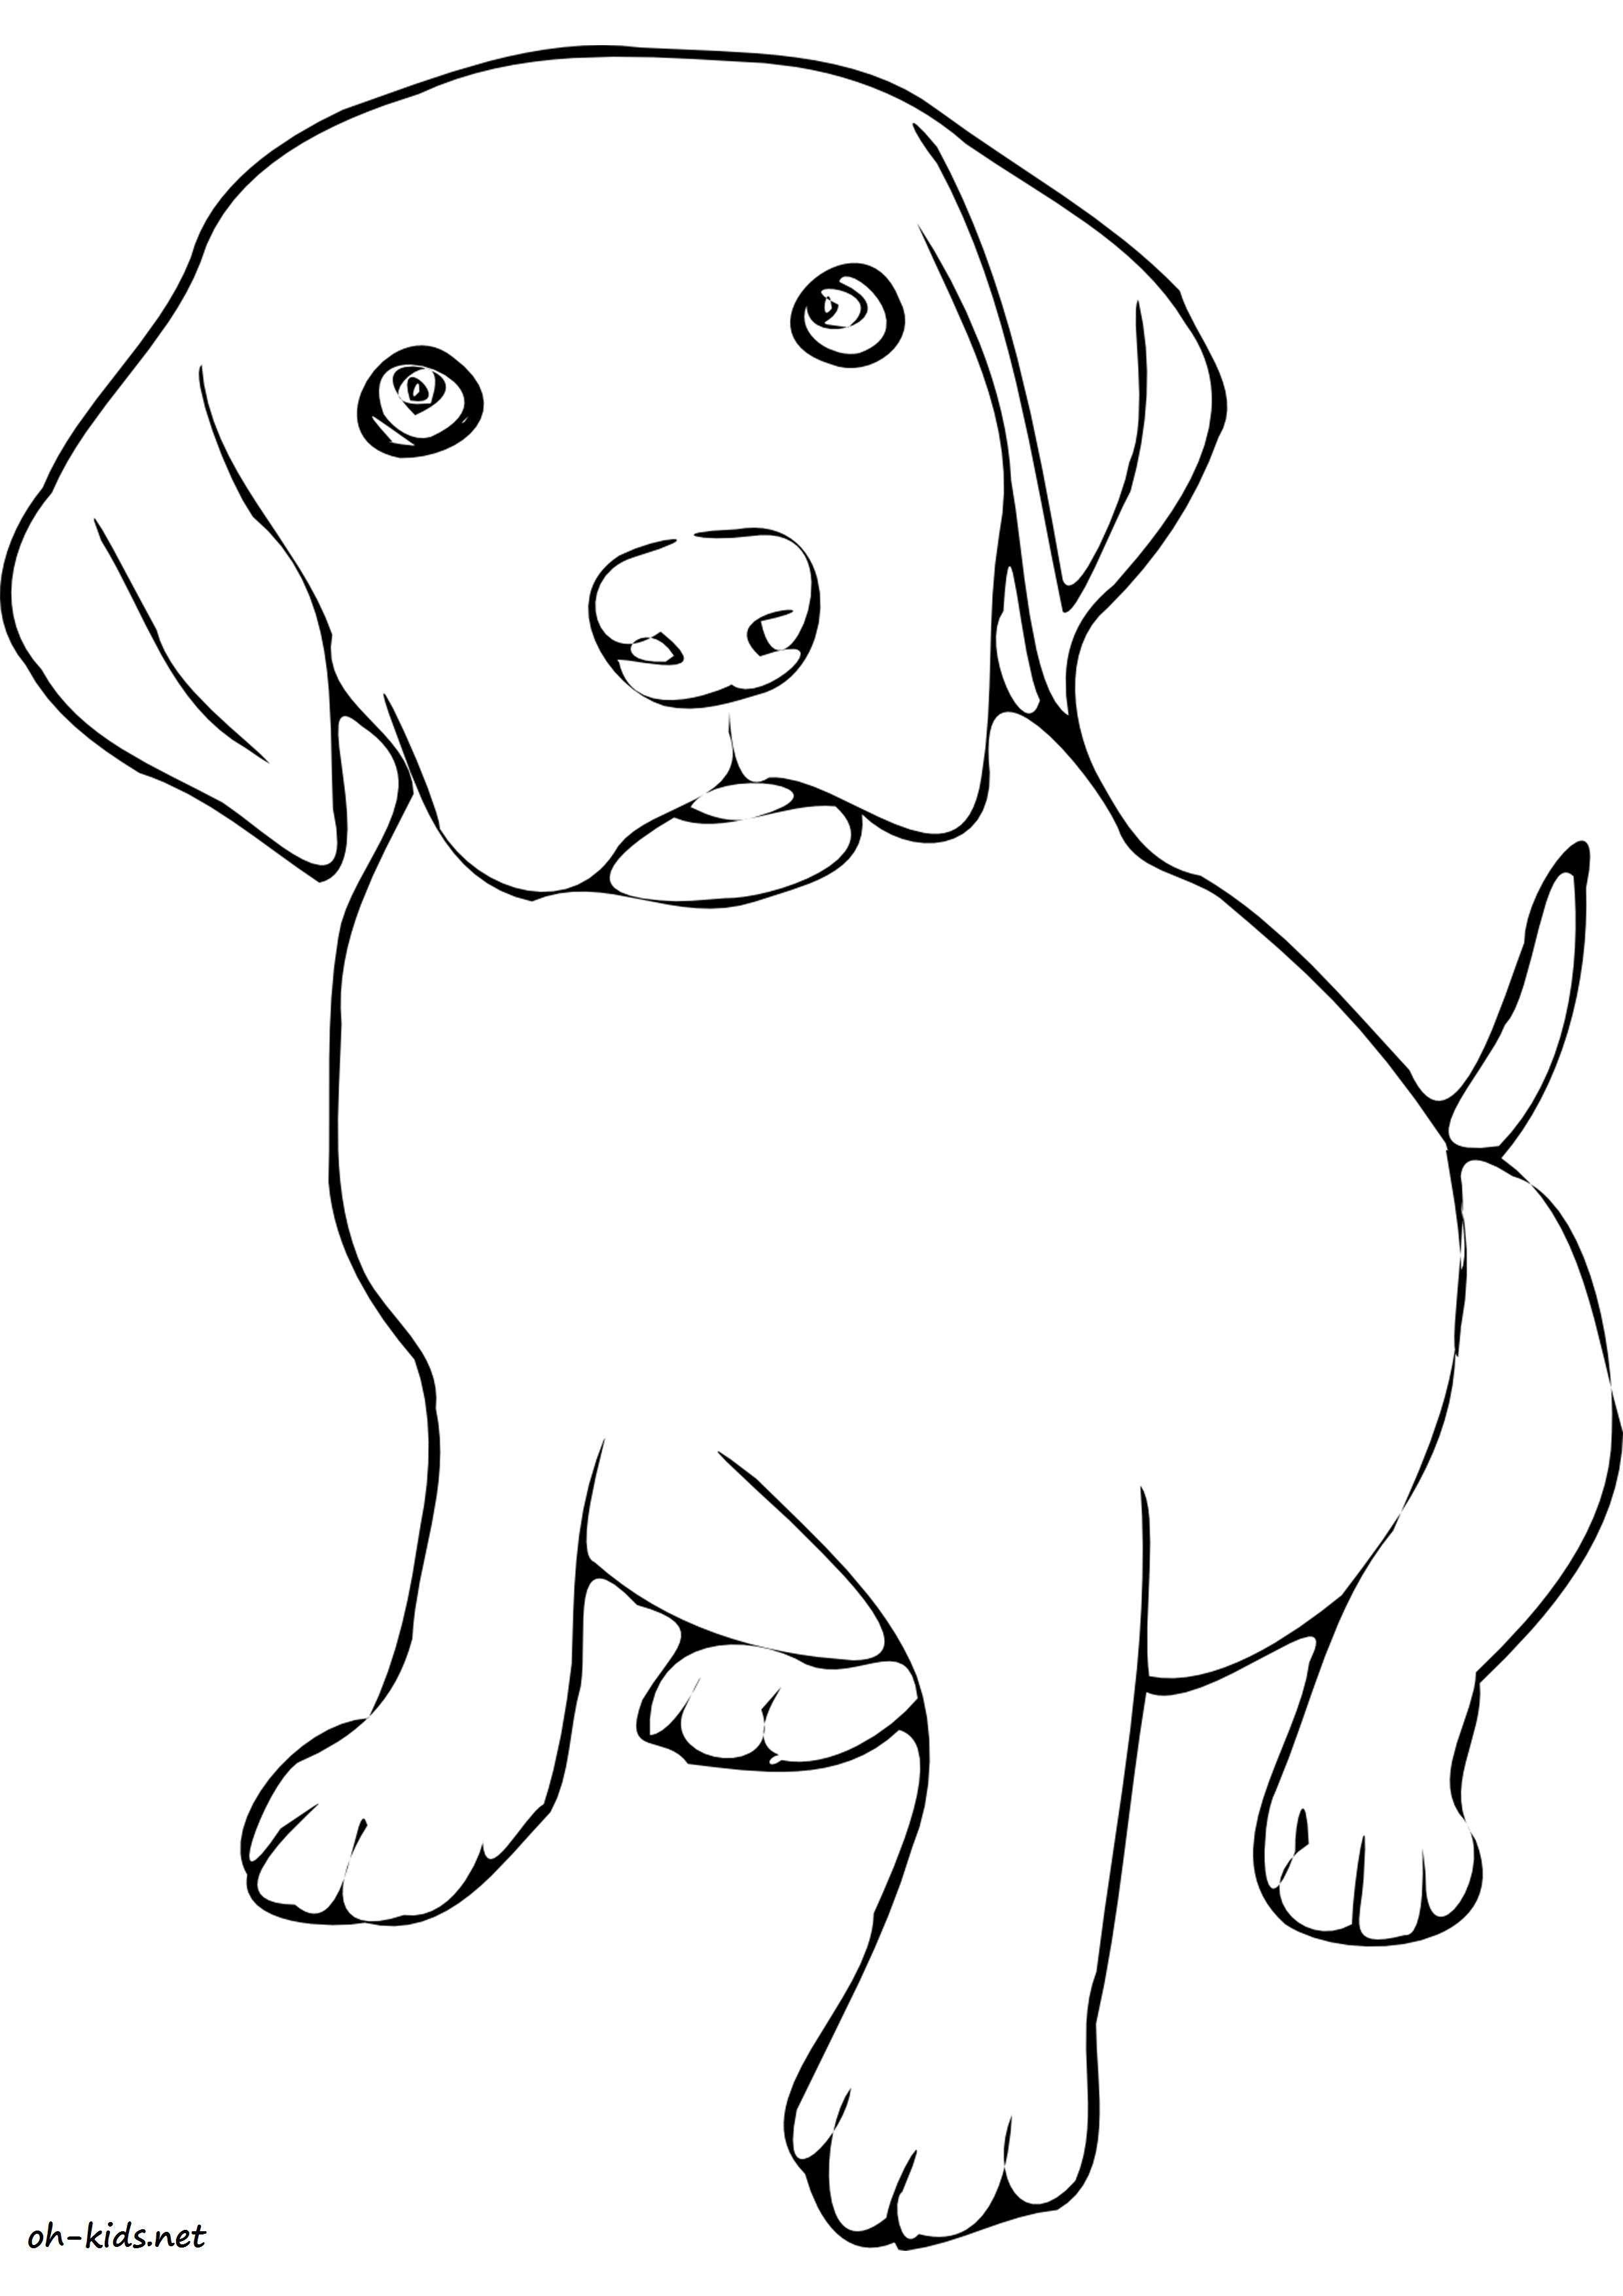 Dessin #1105 - Coloriage Labrador À Imprimer - Oh-Kids avec Coloriage Labrador